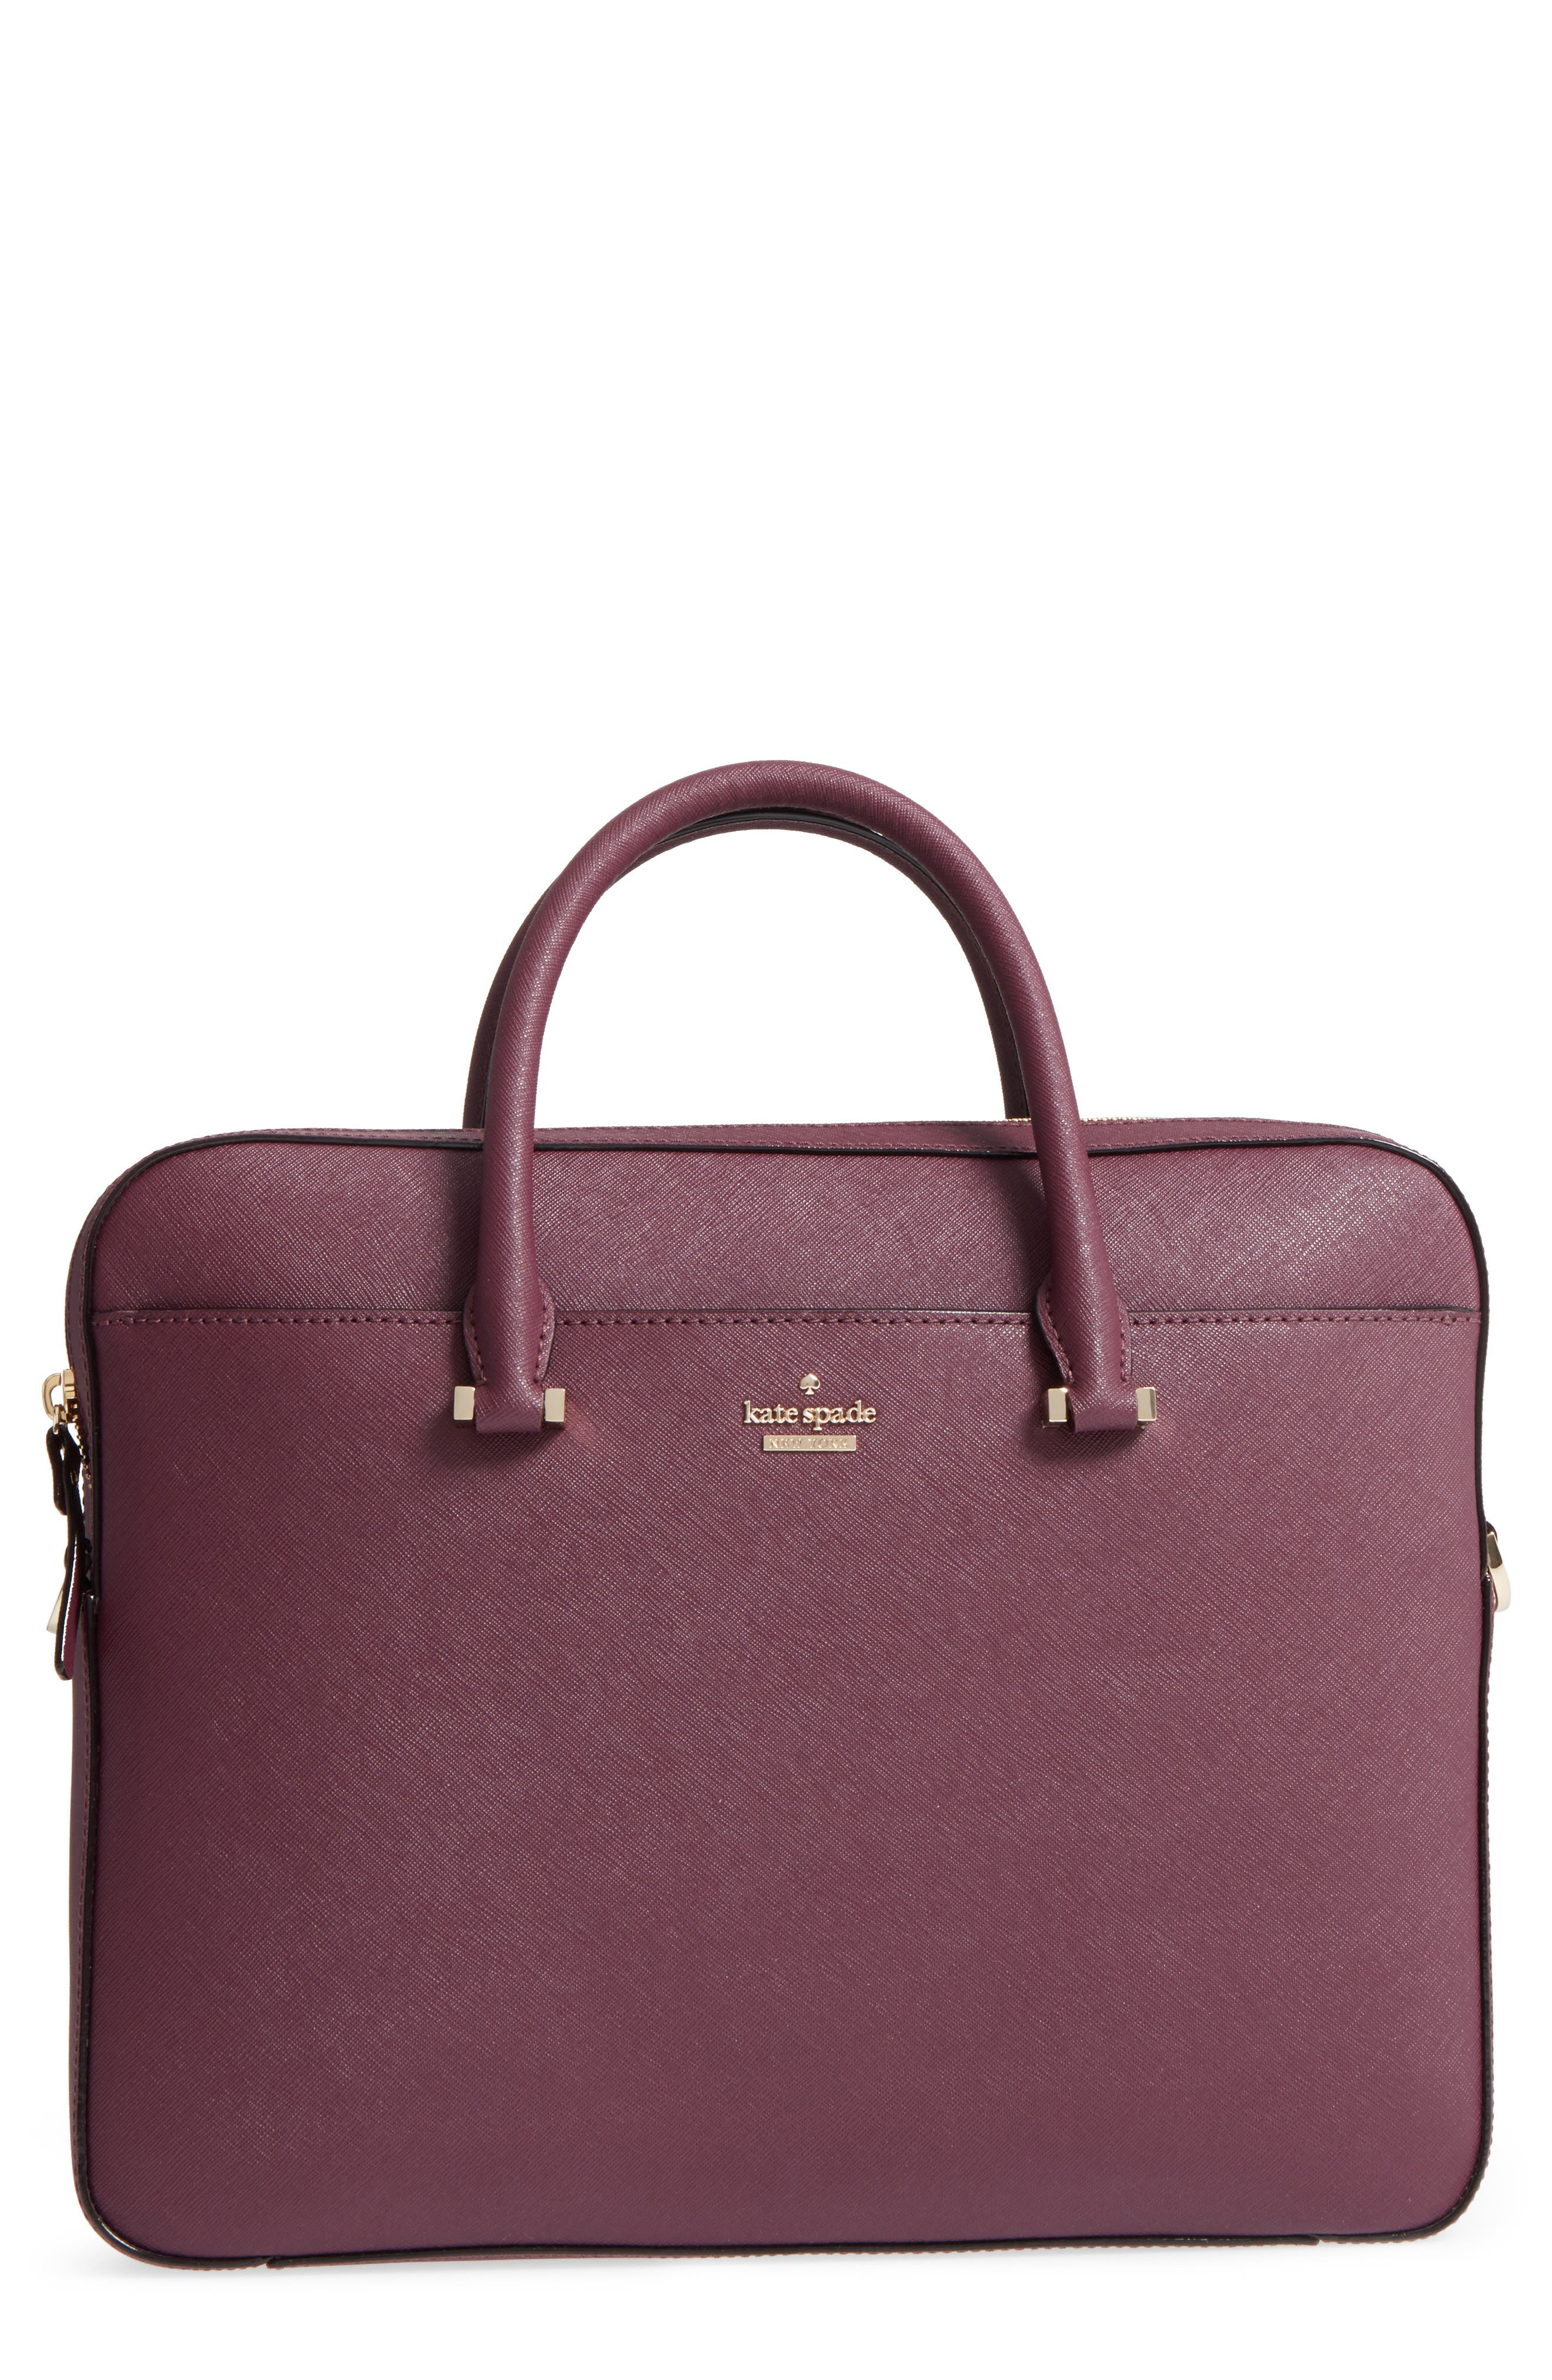 Alternate Image 1 Selected - kate spade new york saffiano leather laptop bag